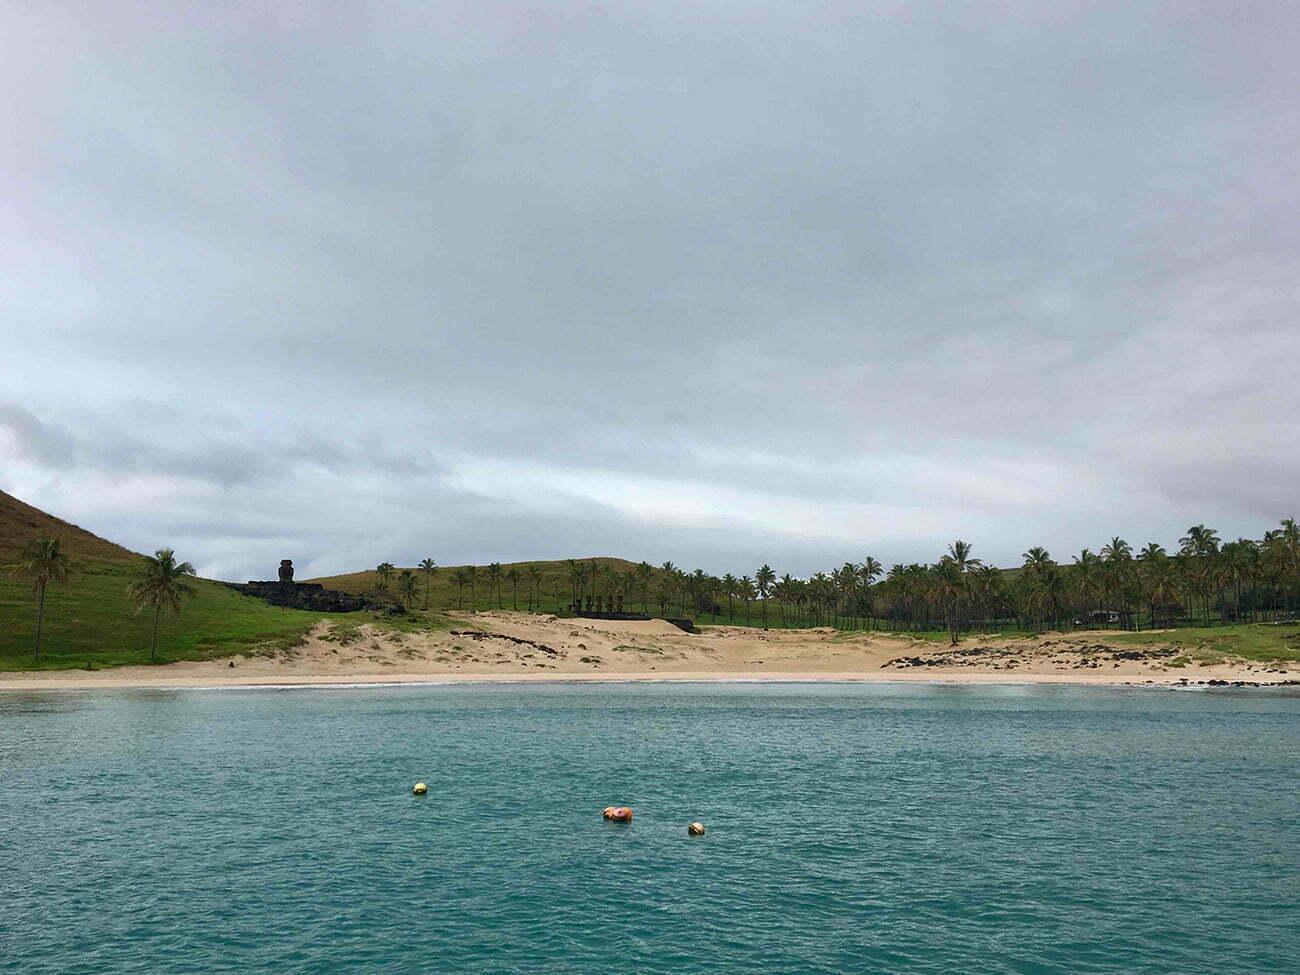 imagem da praia anakena, em Rapa Nui